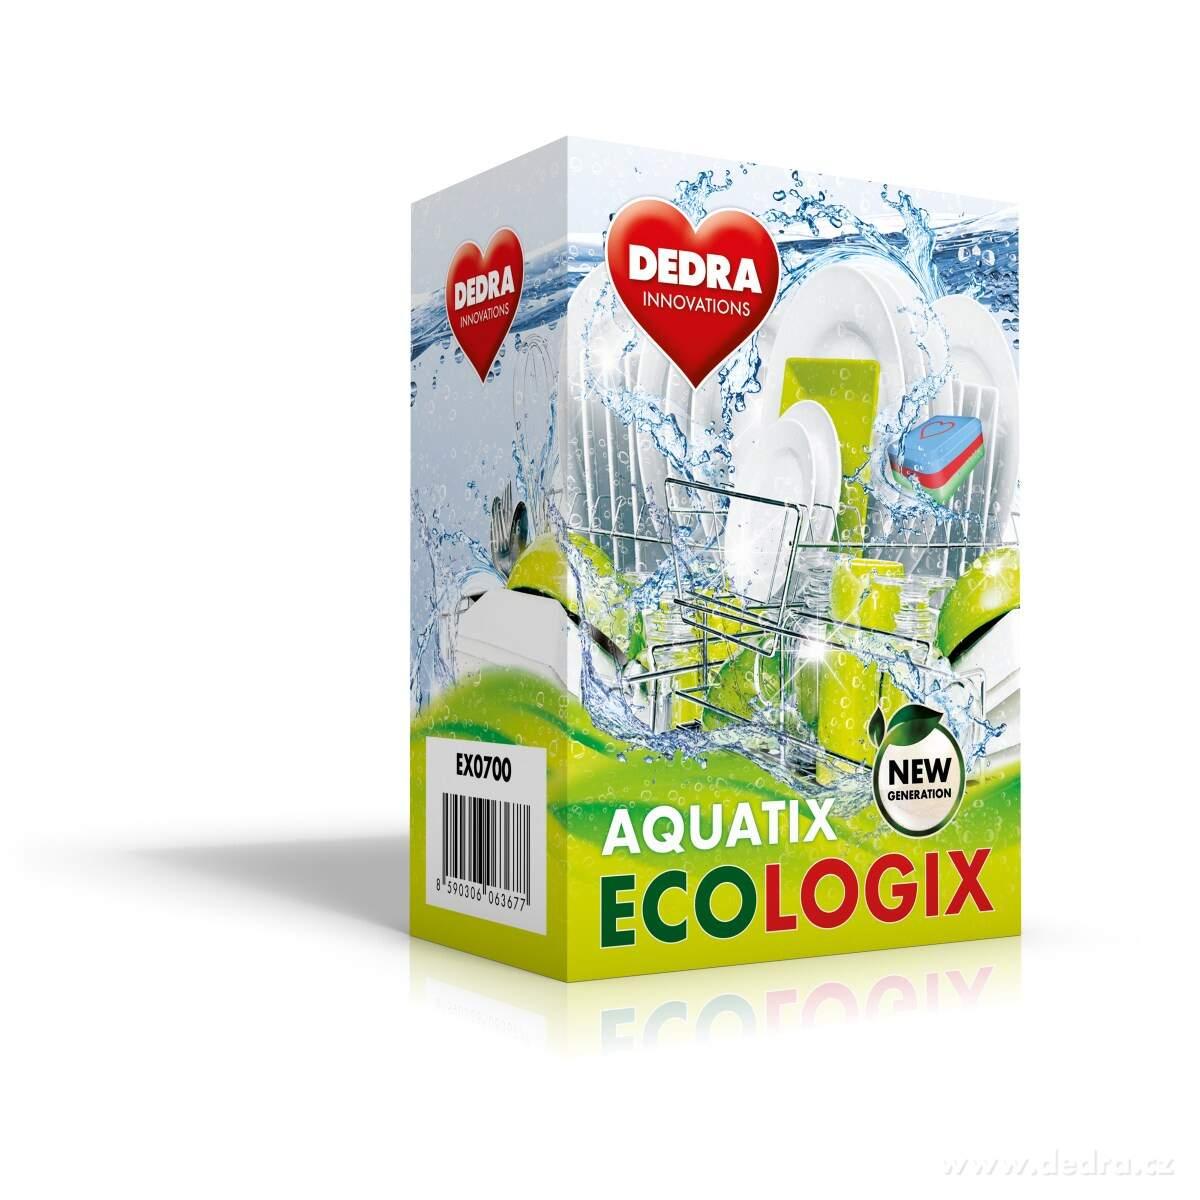 Dedra Aquatix ecologix multifunkční tablety do myčky, 60 tablet